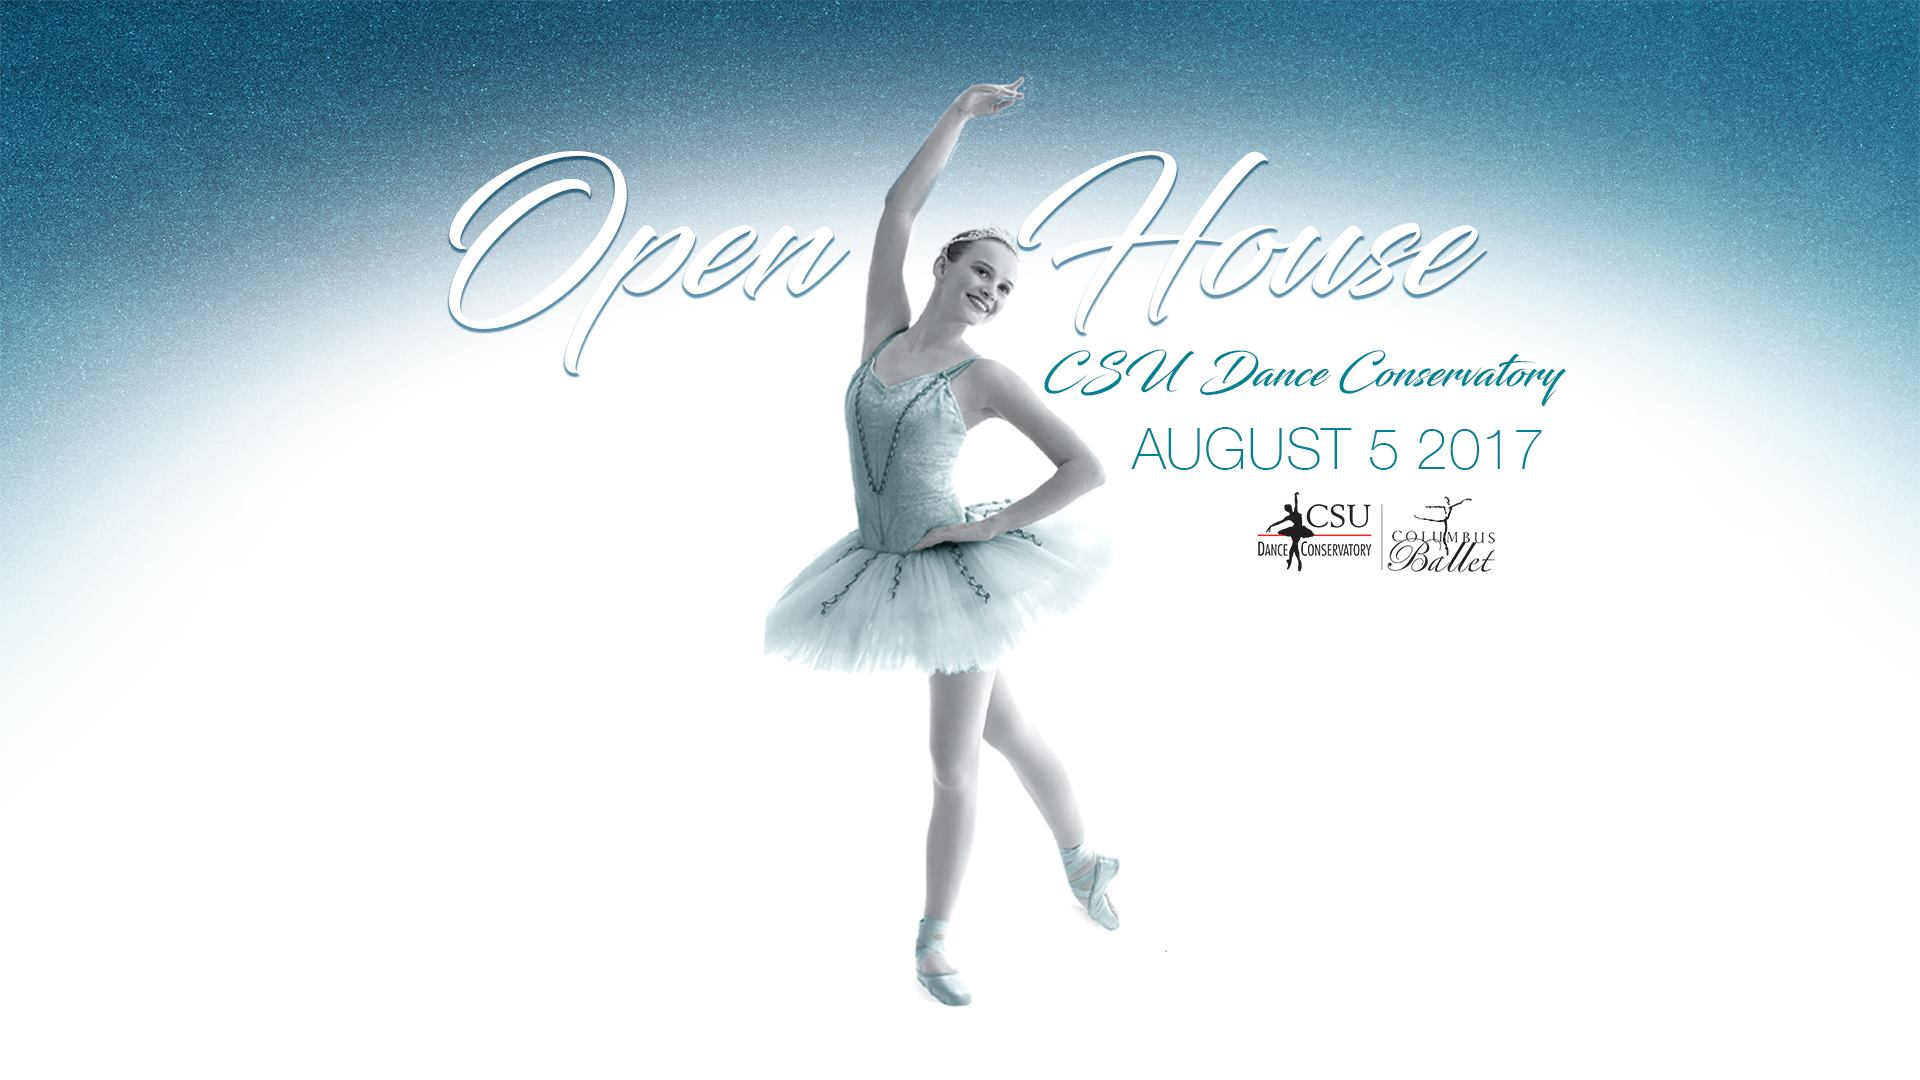 Ballet OH Invite Image 2